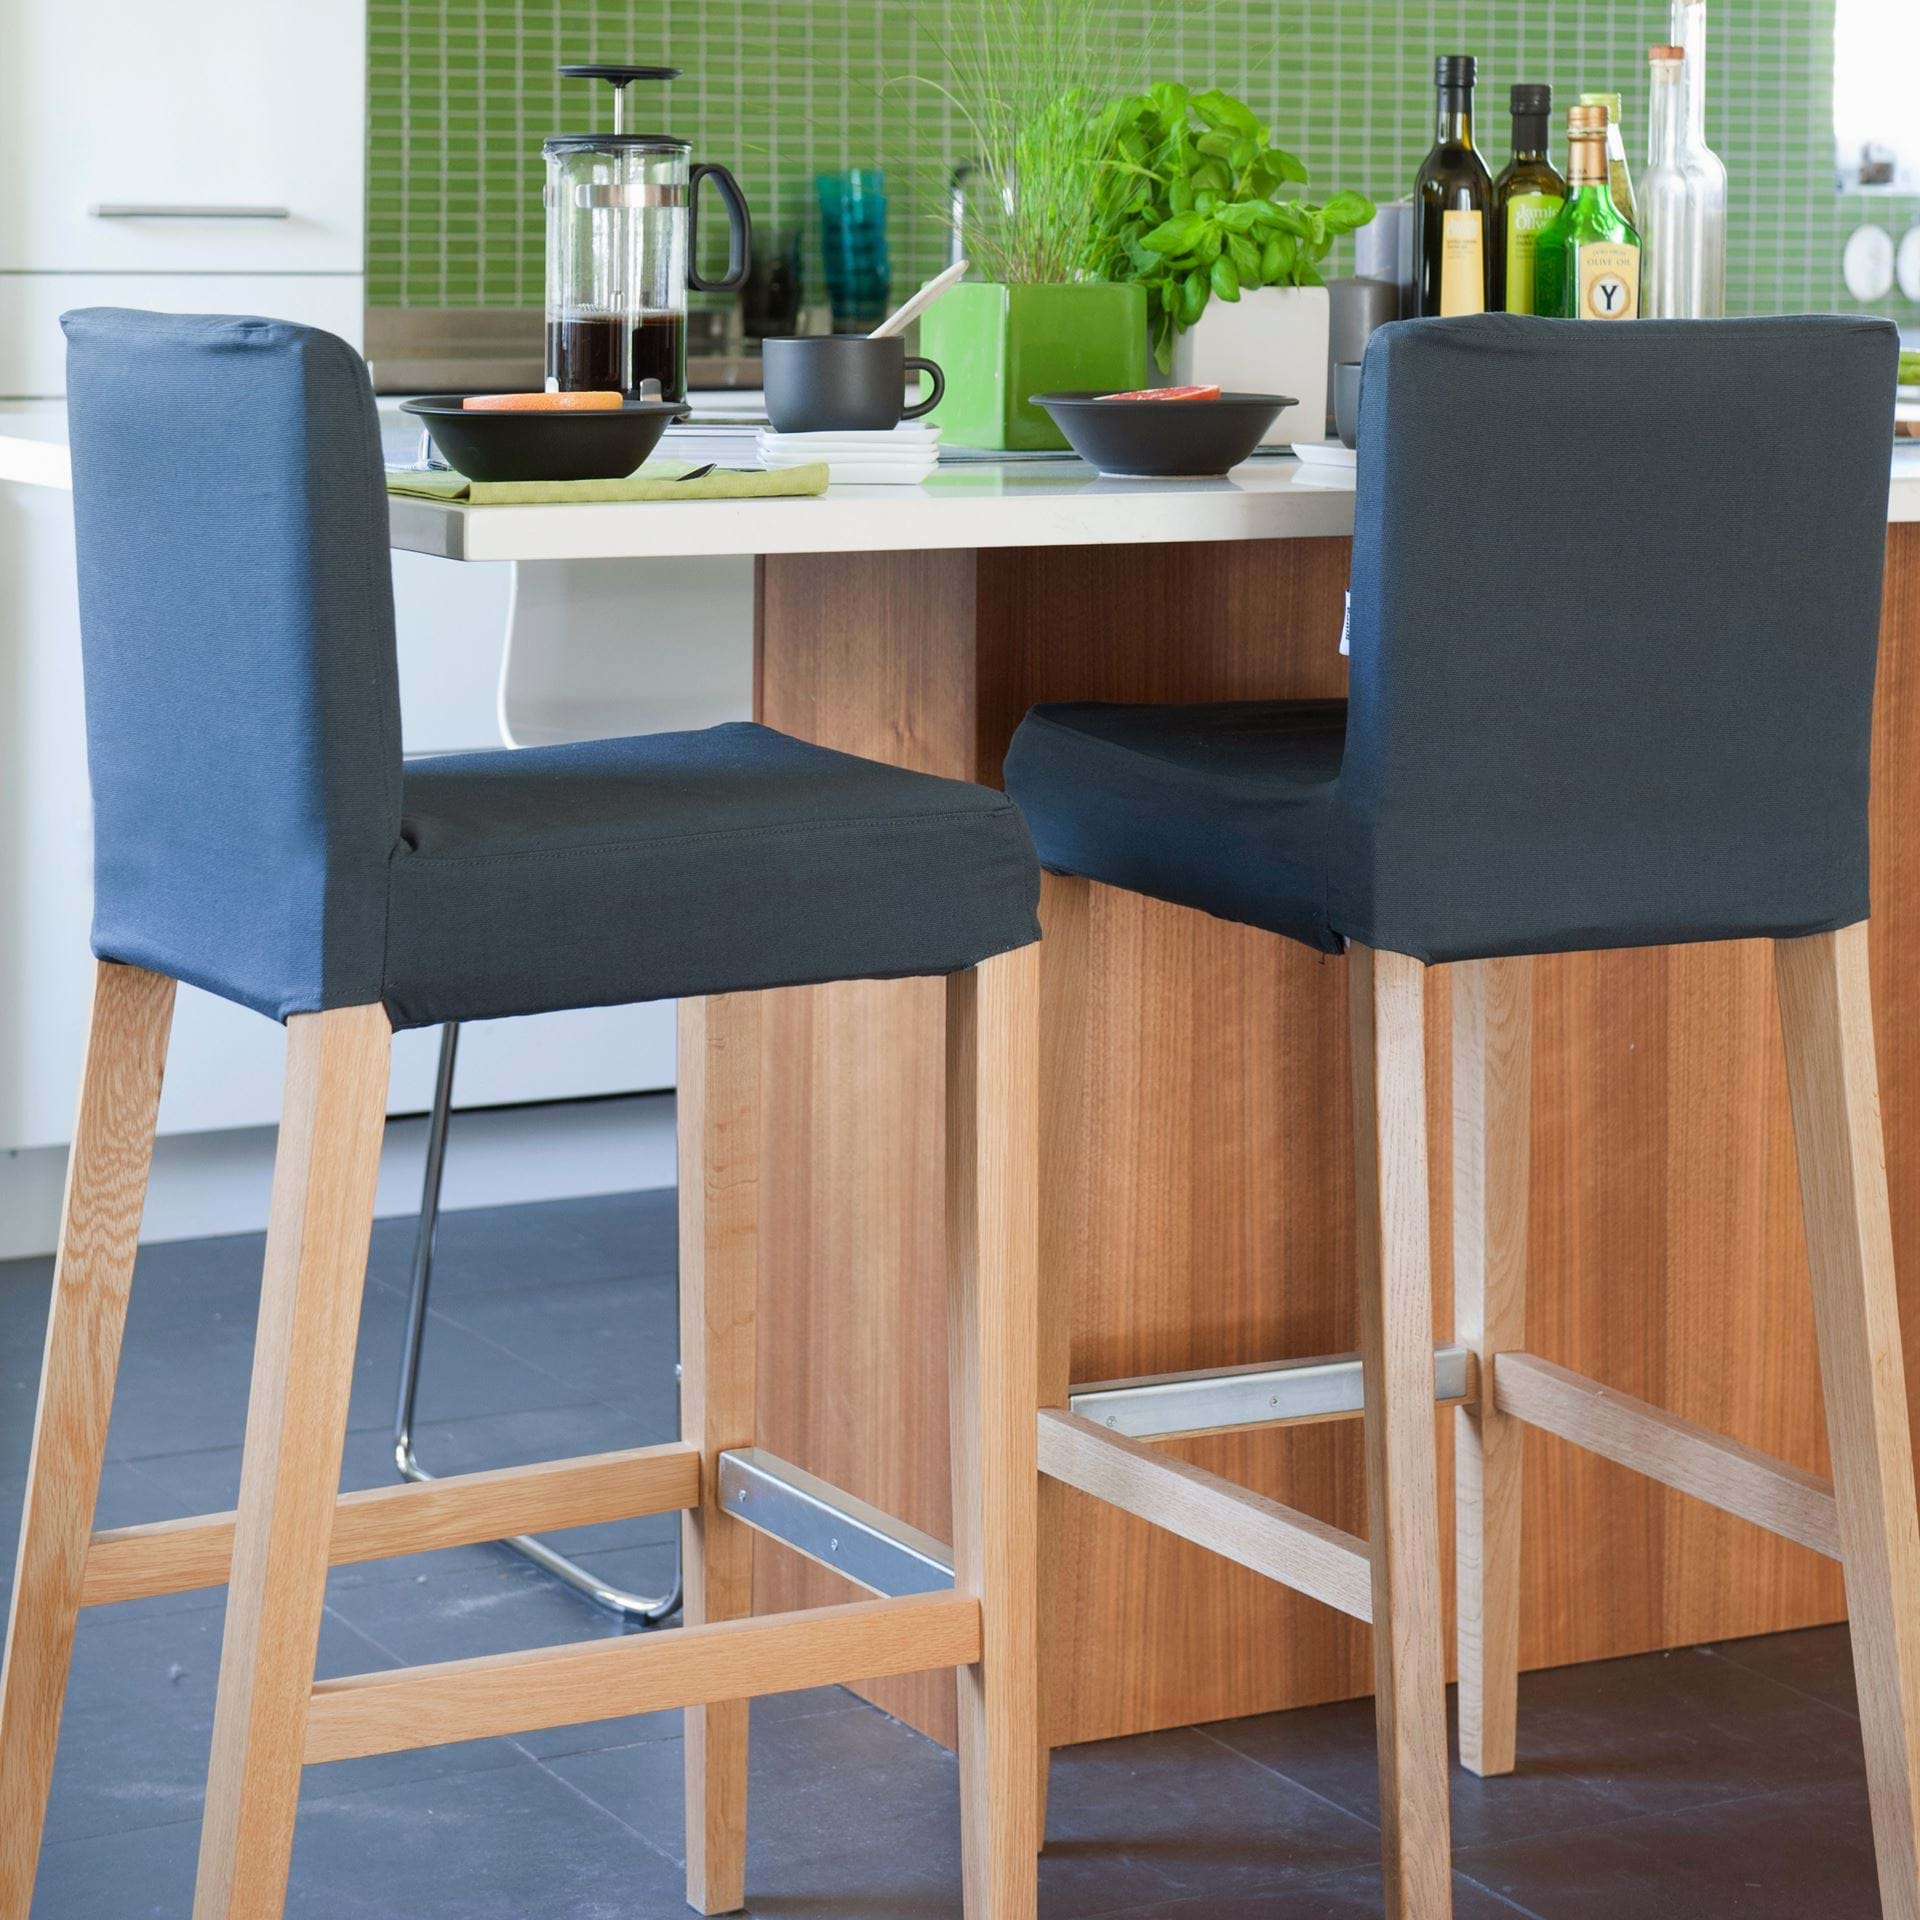 Astonishing Henriksdal Barstool Cover Standard Model Bemz Machost Co Dining Chair Design Ideas Machostcouk